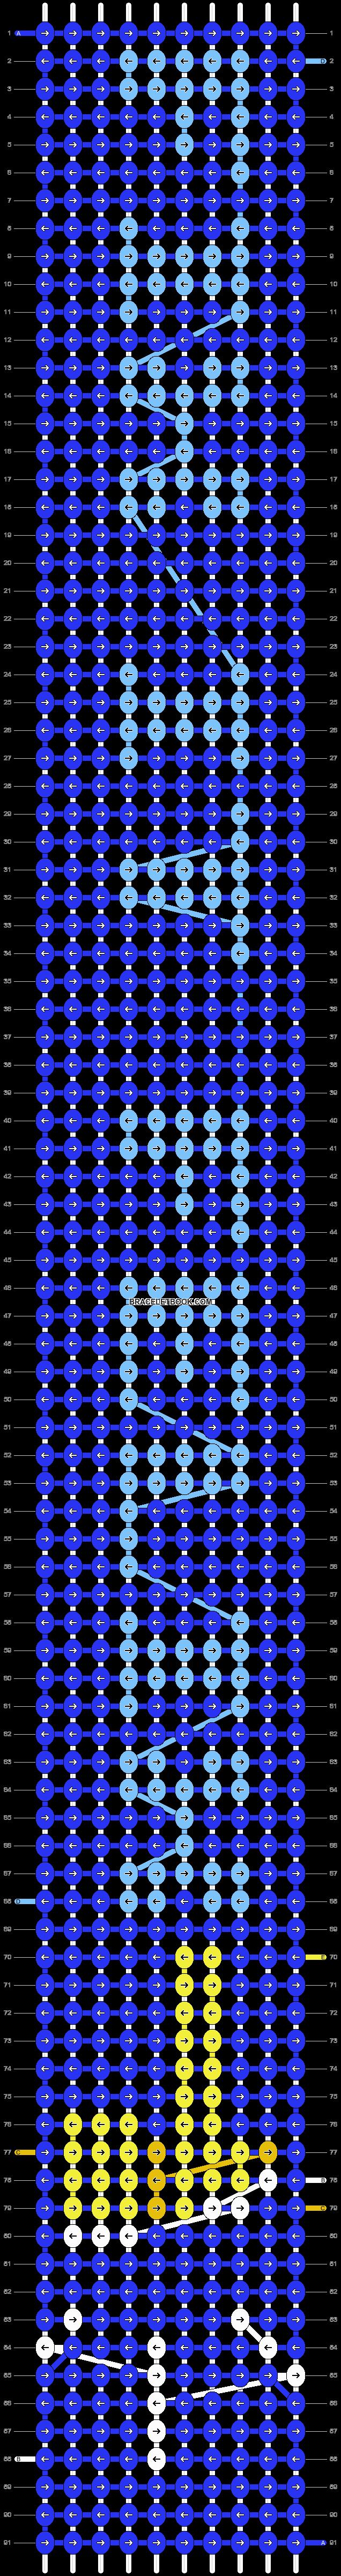 Alpha pattern #15040 pattern